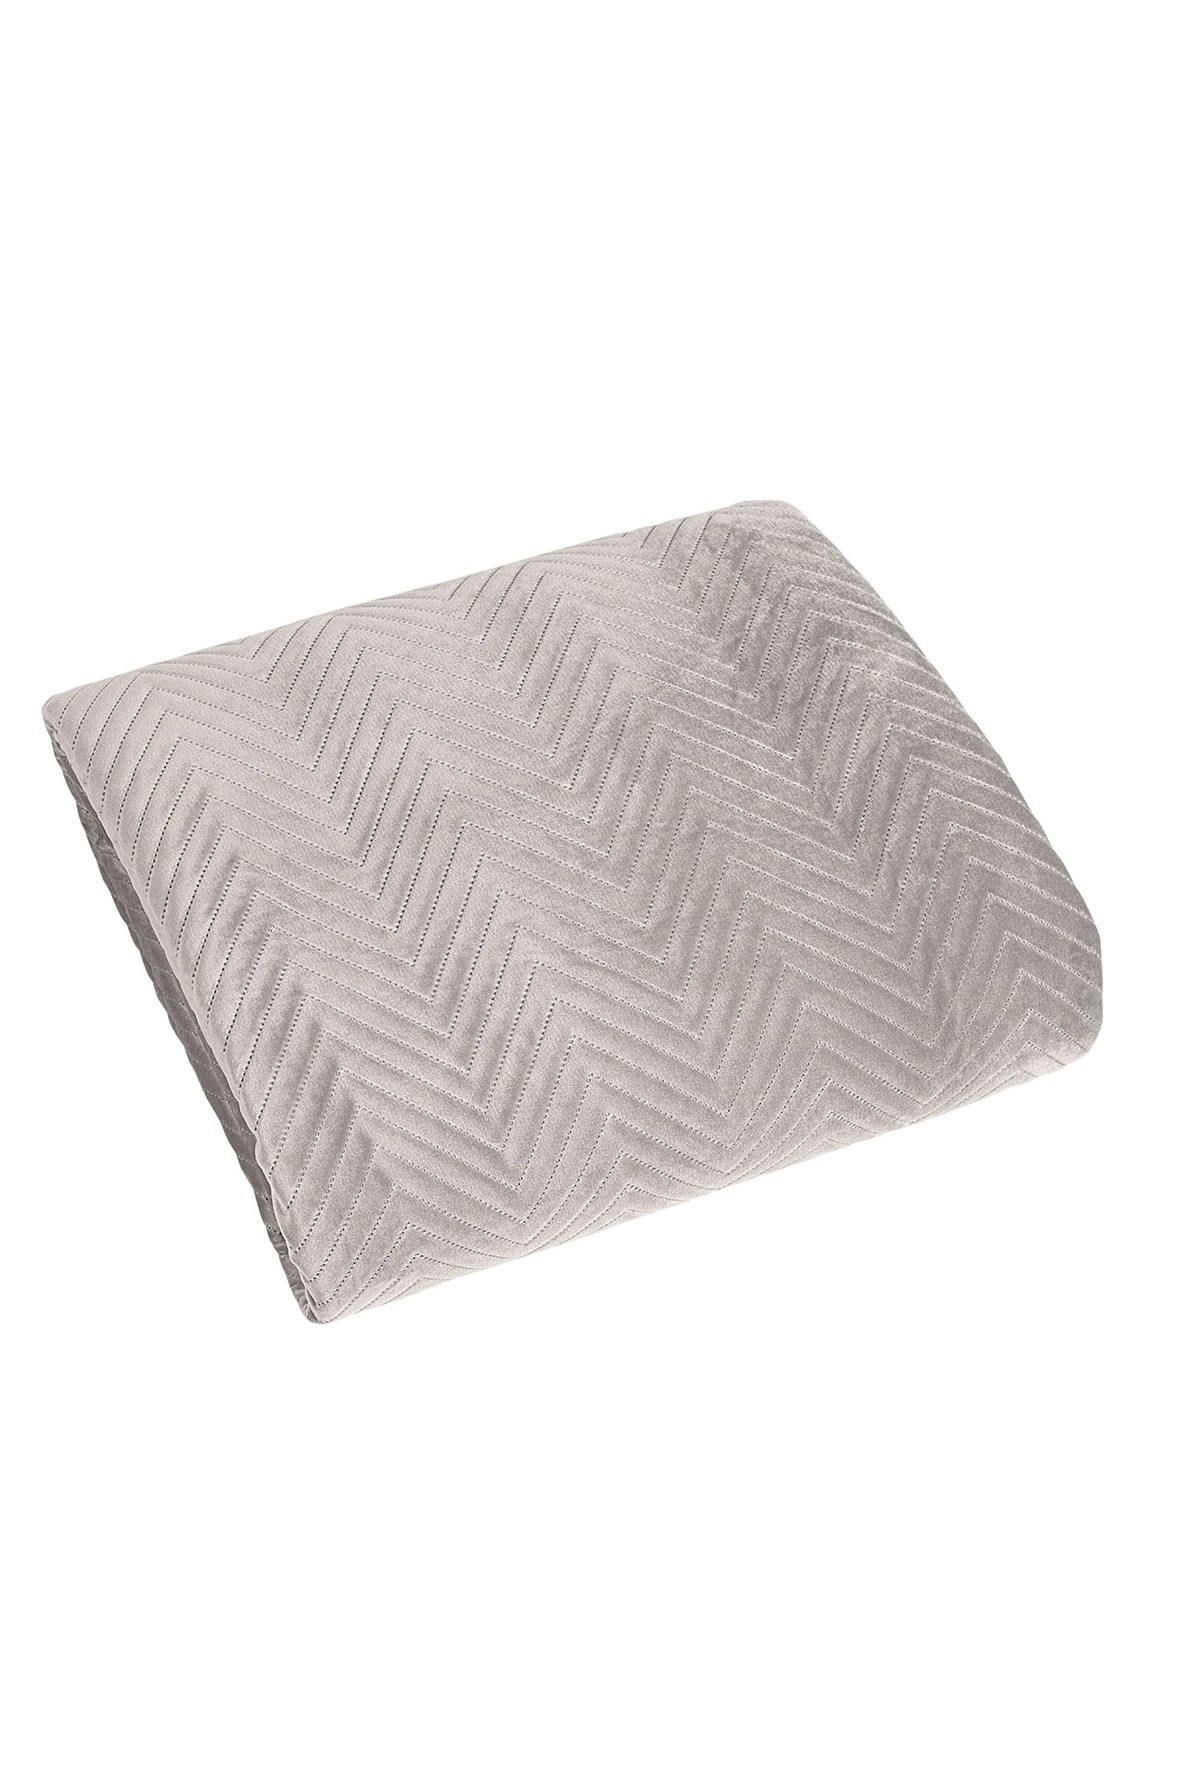 Narzuta na łóżko - beżowa  w jodełkę- 220x240 cm